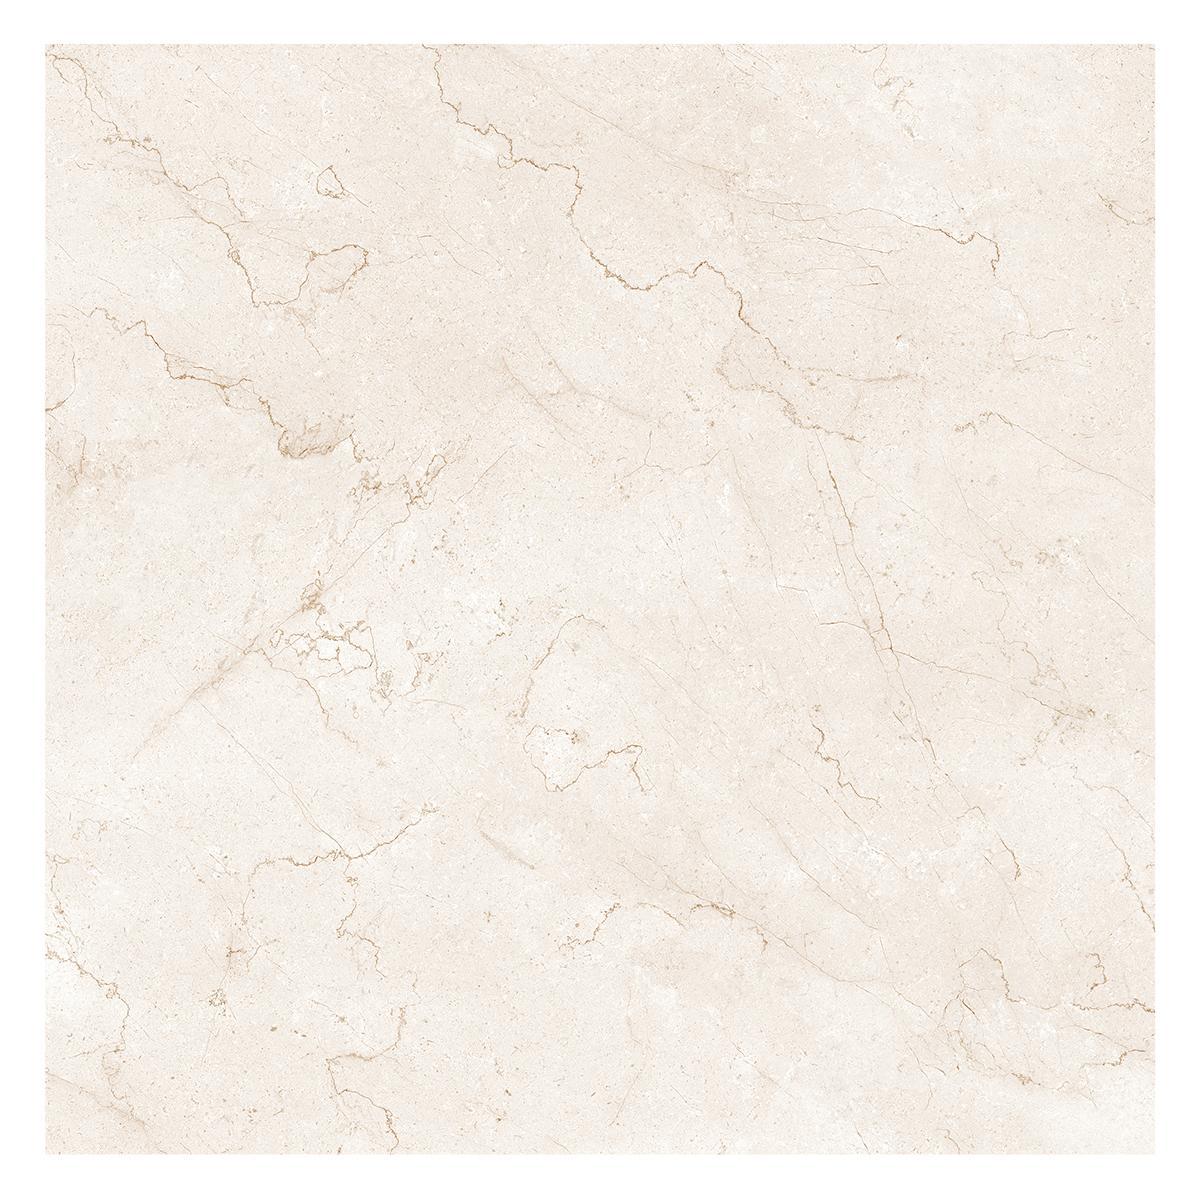 Porcelanato Sarca Beige Brillante - 90X90 cm - 1.62 m2